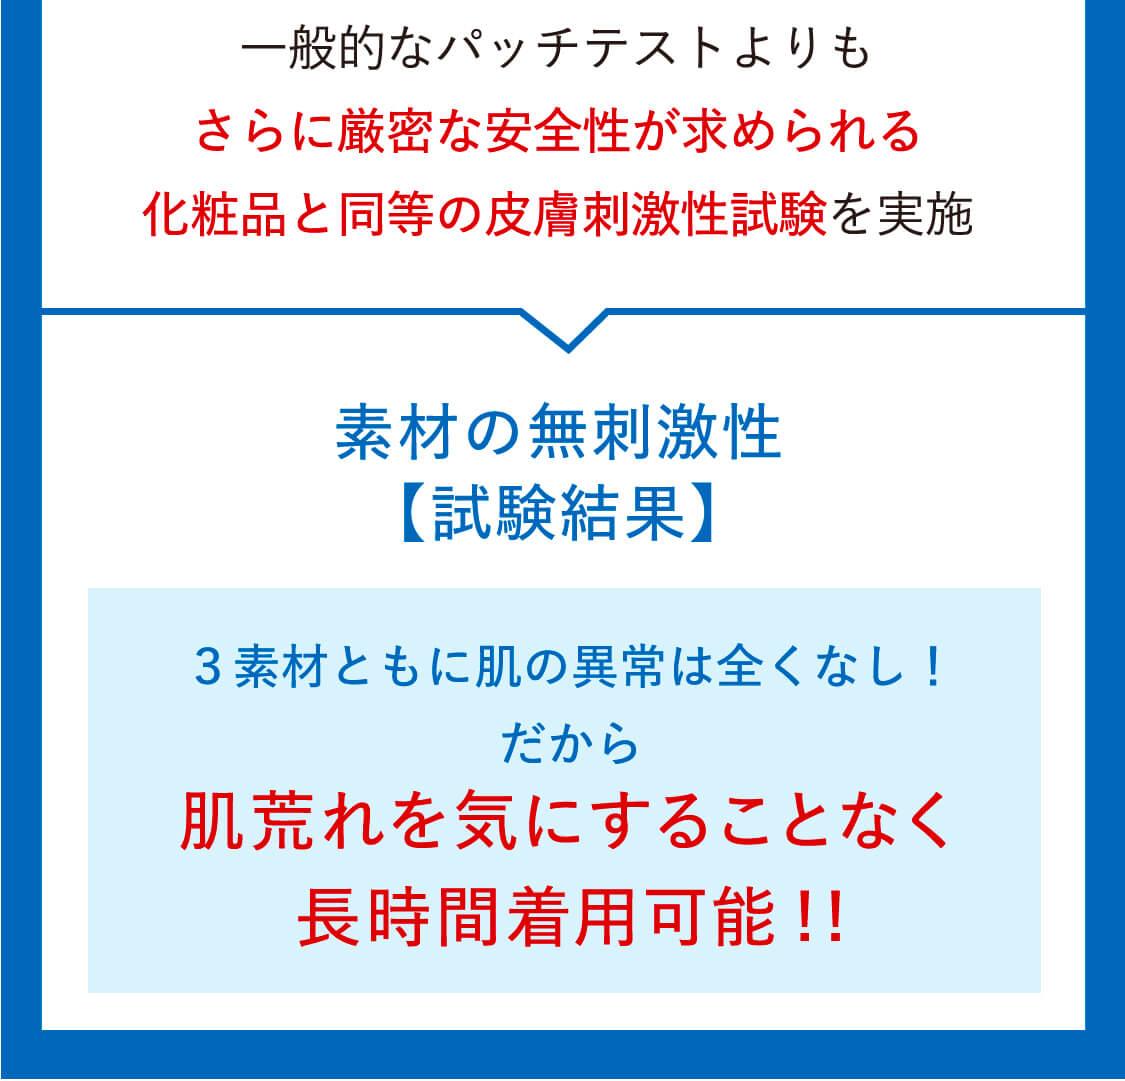 素材の無刺激生【試験結果】